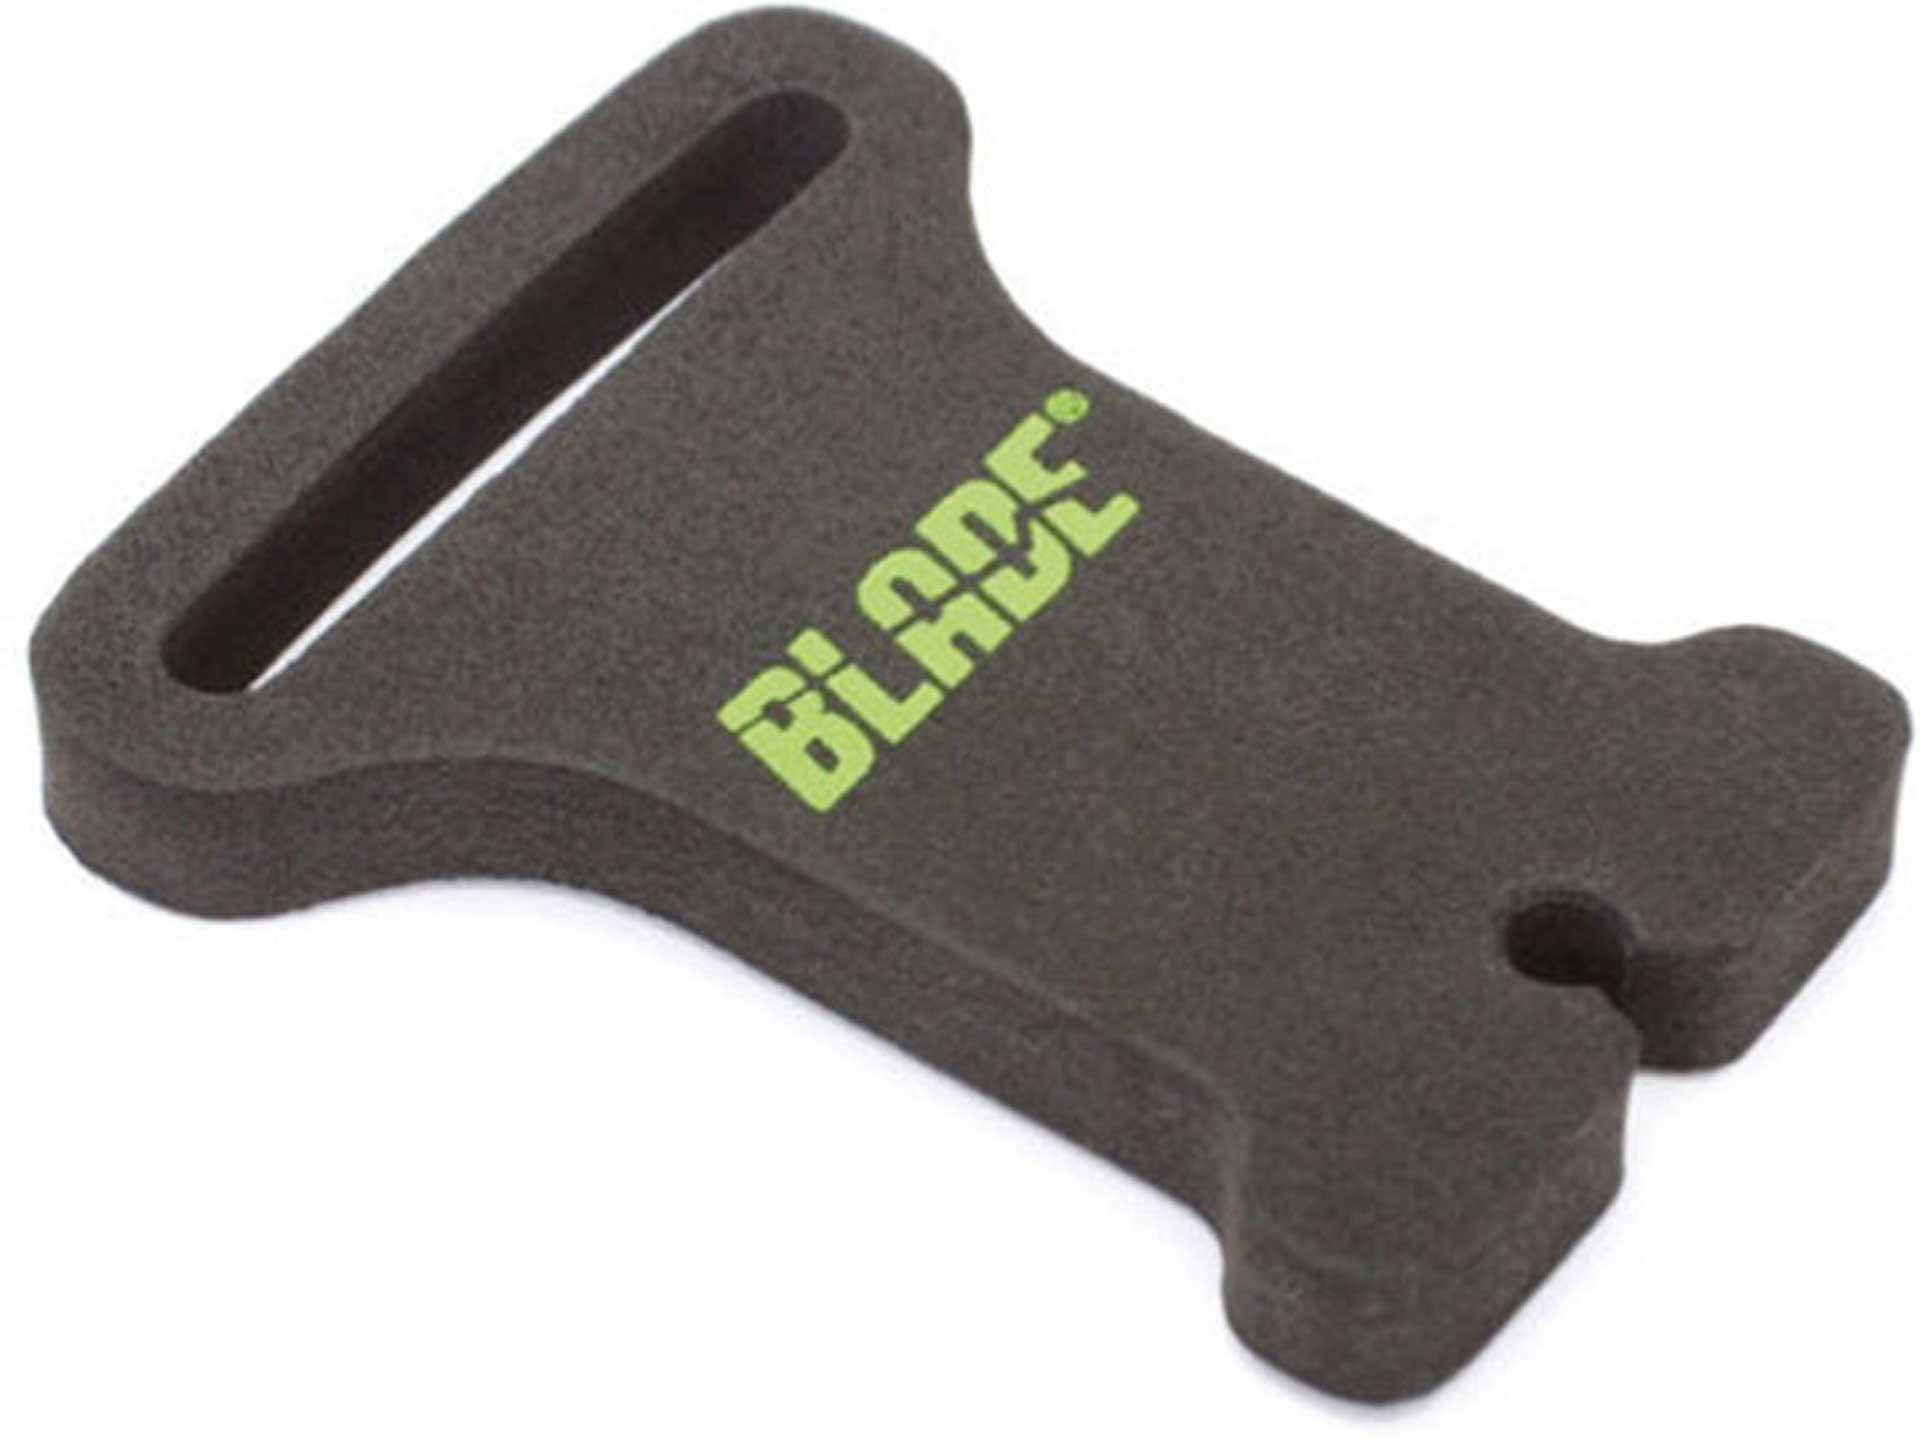 BLADE (E-FLITE) BLATTHALTER HAUPTROTORKOPF BLADE 200